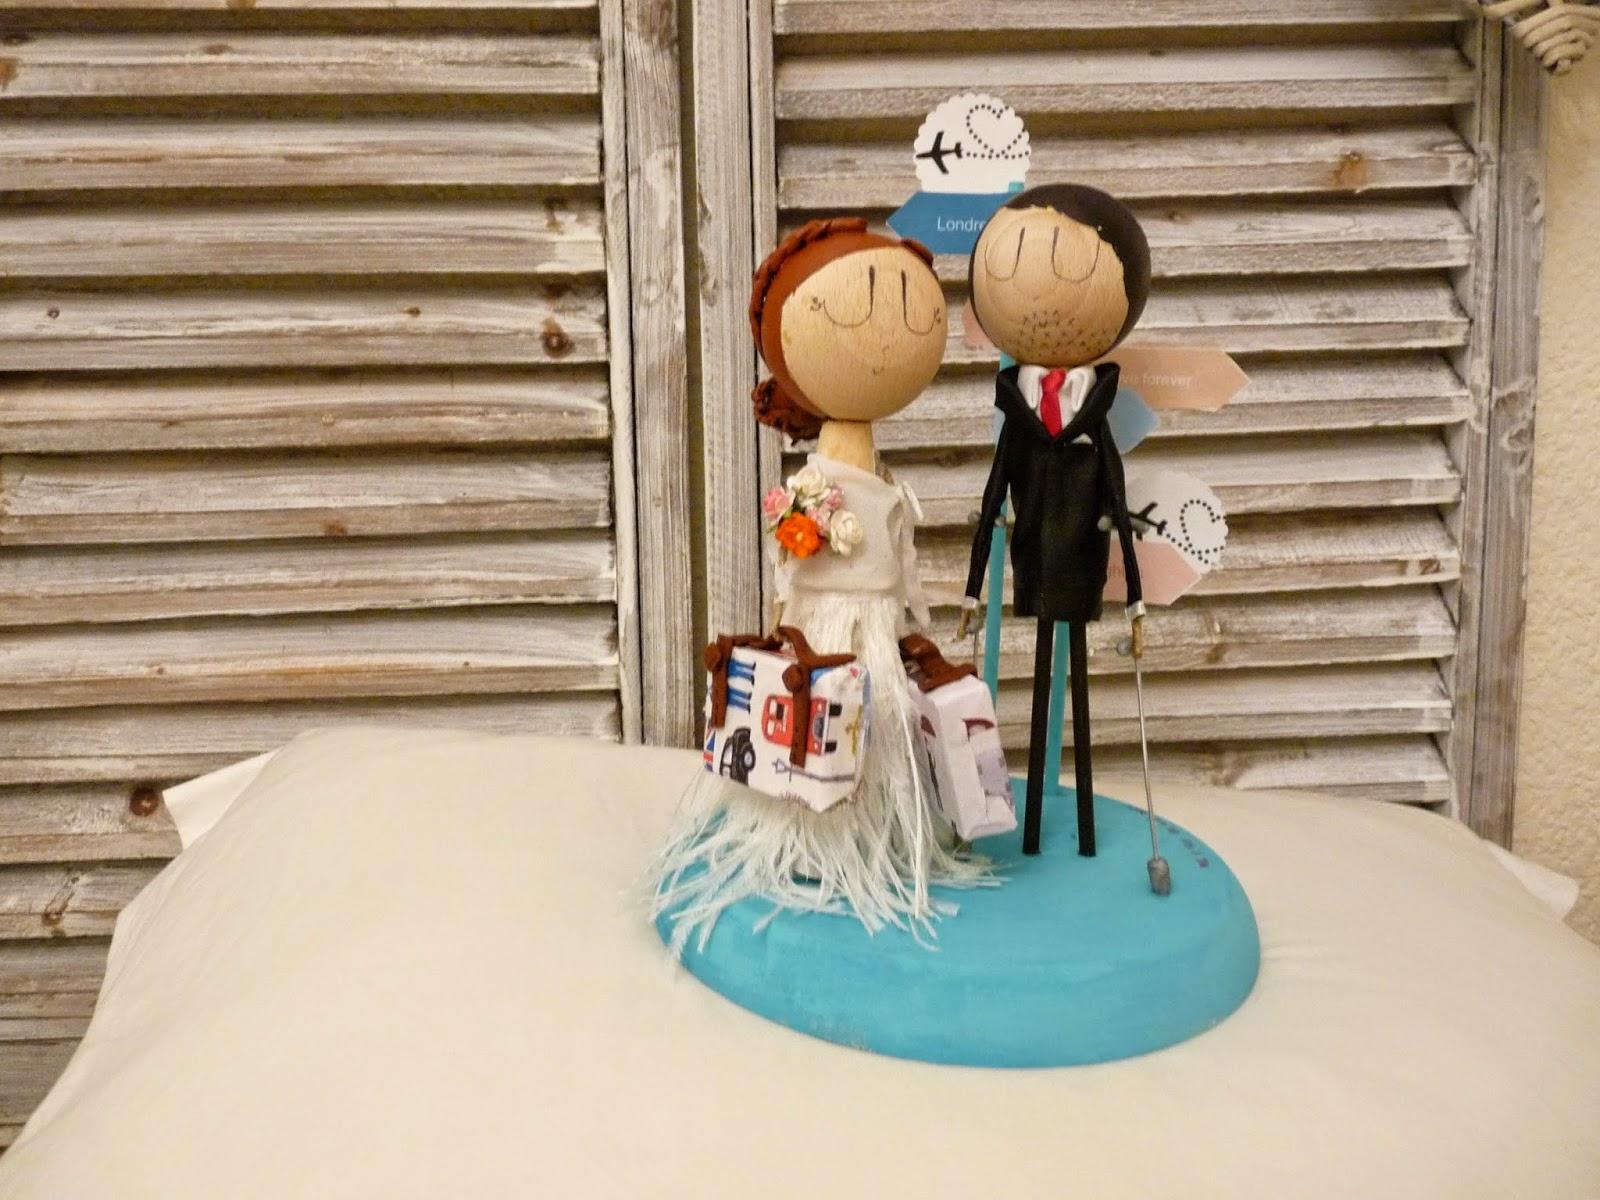 novios pastel personalizados, figuras tarta, muñecos pastel, novios, novios originales, novios con encanto, cake topper, muñecos pastel personalizados, tarta boda, pastel nupcial,mr&mrsbyani,